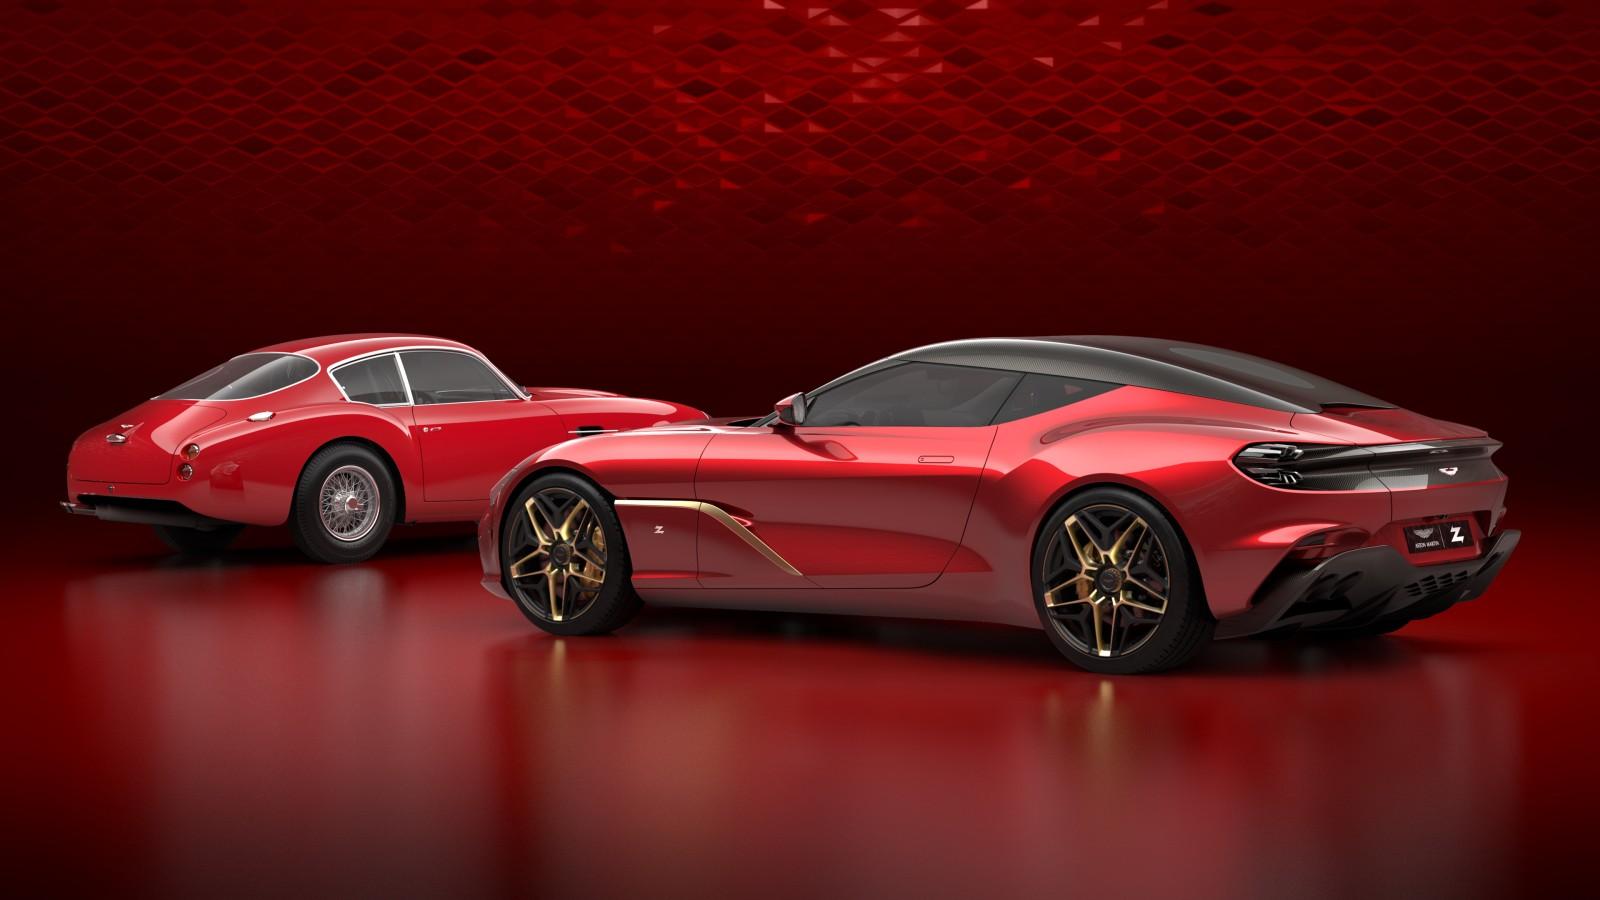 Aston Martin Dbs Gt Zagato 2019 4k 2 Wallpaper Hd Car Wallpapers Id 12901